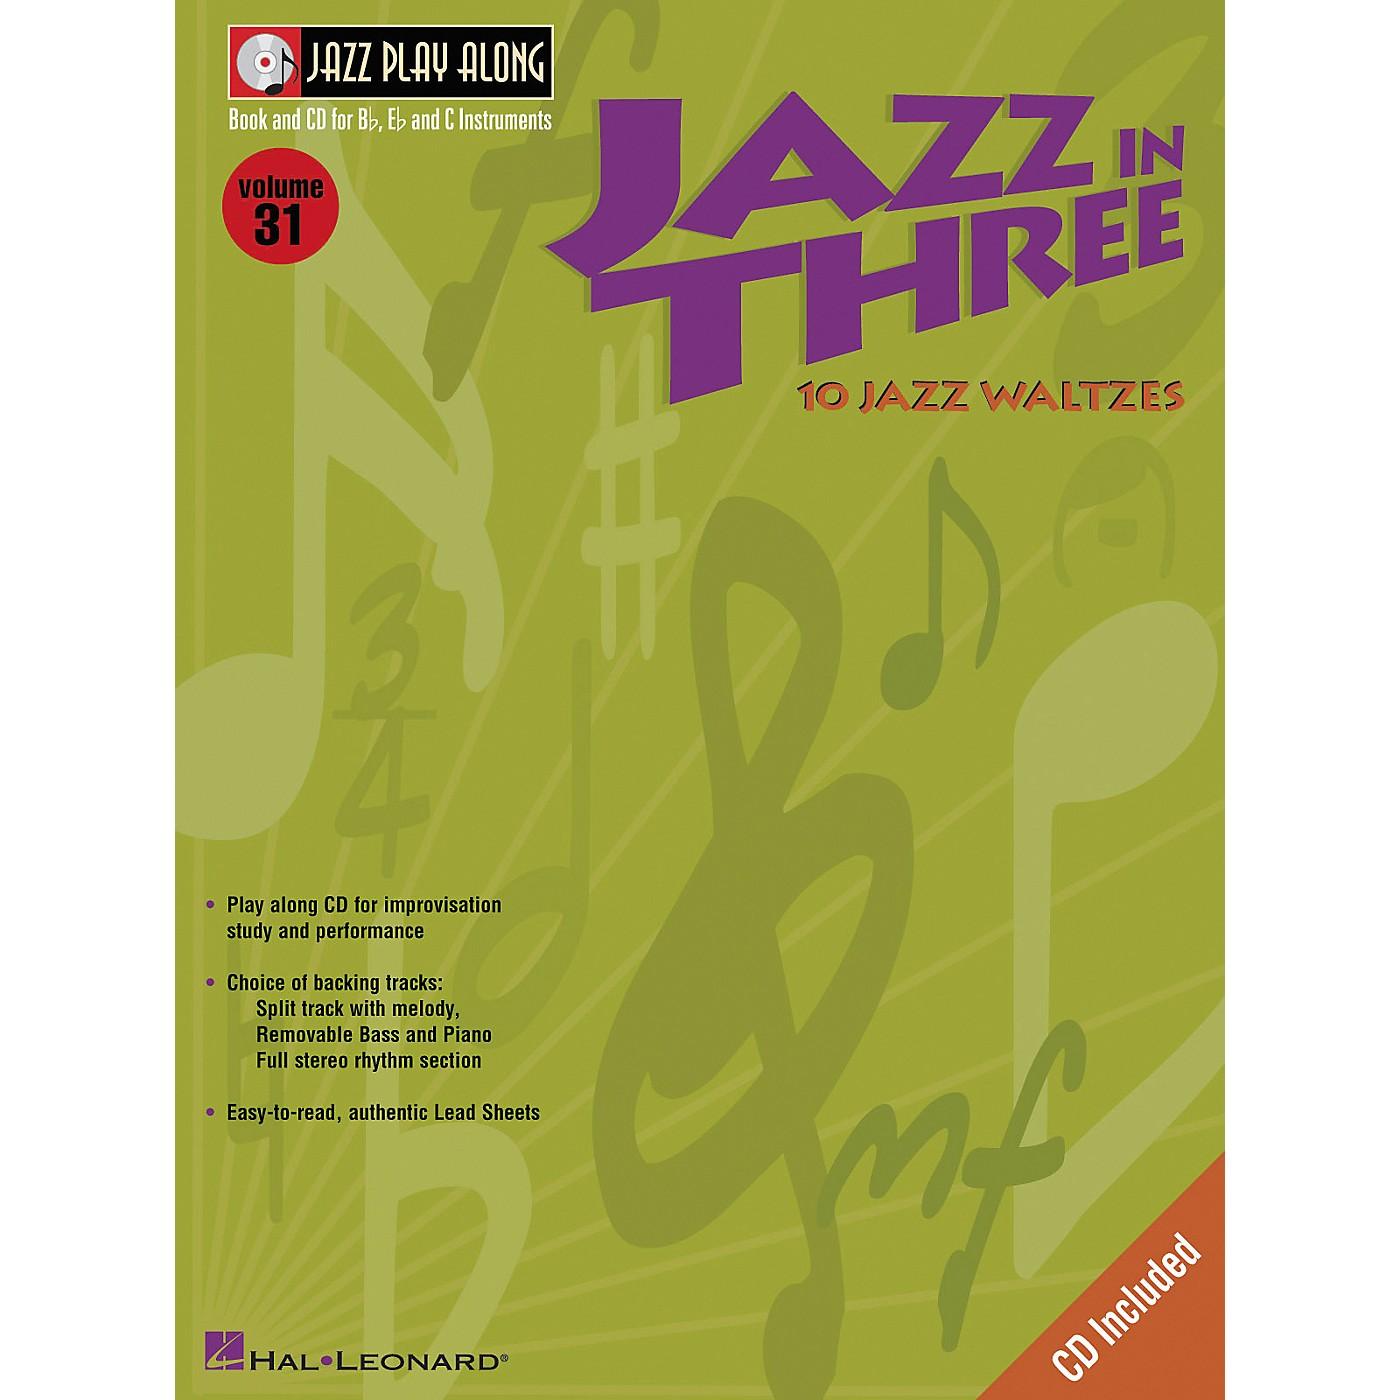 Hal Leonard Jazz in Three (Eb Instruments / C Instruments / Bb Instruments) (Book and CD Package) thumbnail